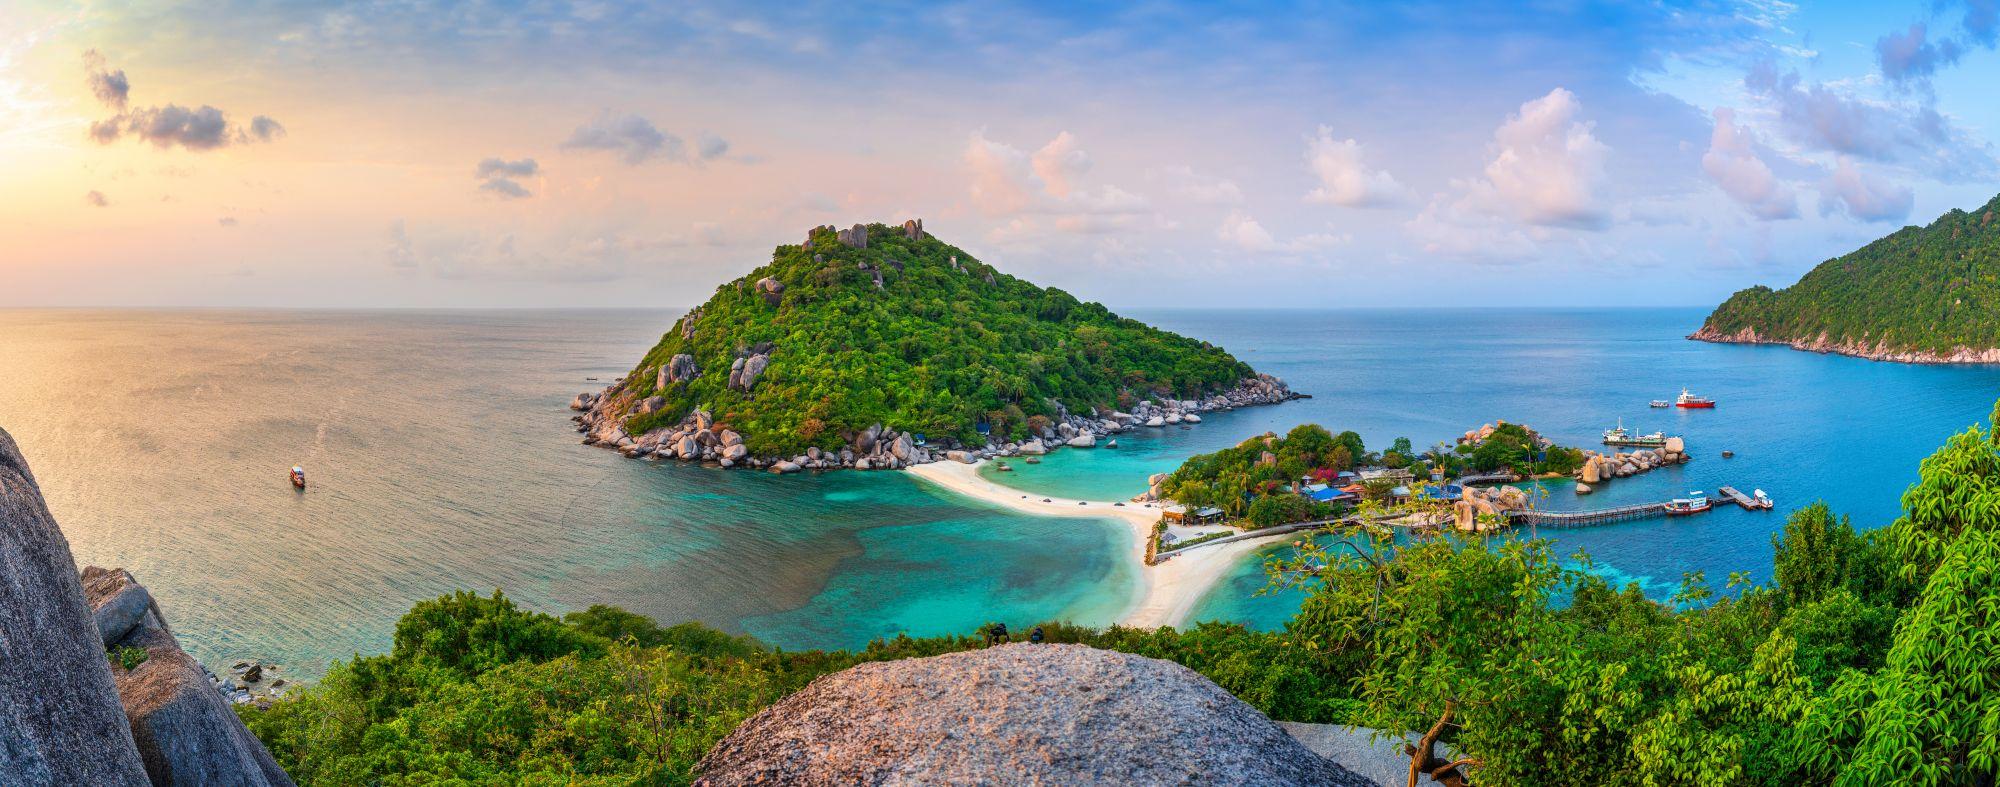 Thailand Koh Nang Yuan Koh Tao uitzichtpunt